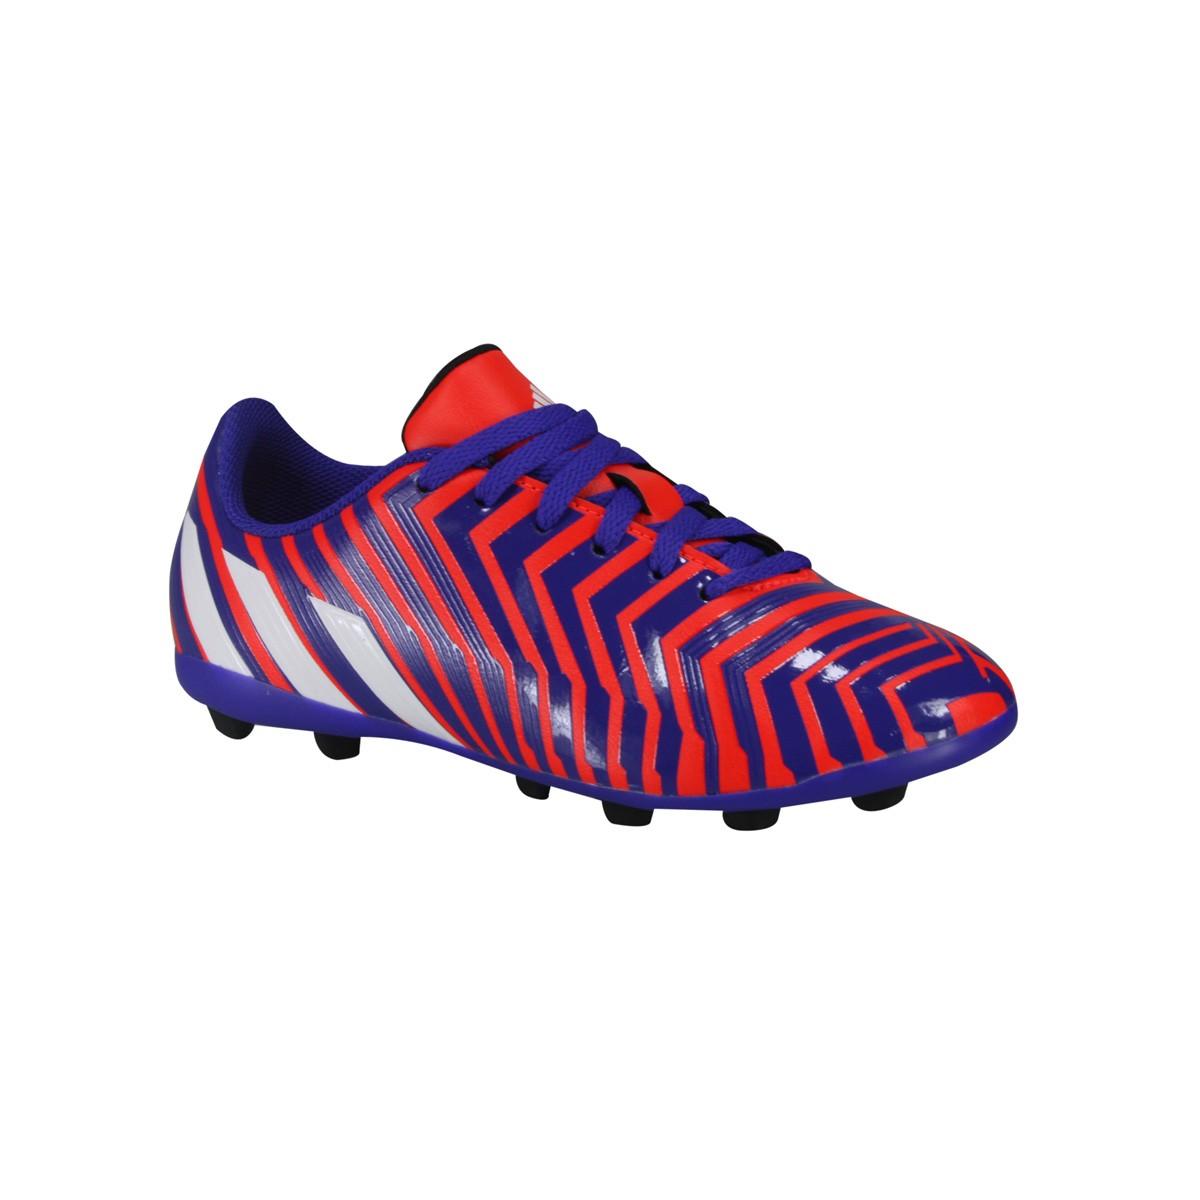 267408860ce Chuteira Infantil Adidas Predito FxG J B44358 - Laranja Roxo ...